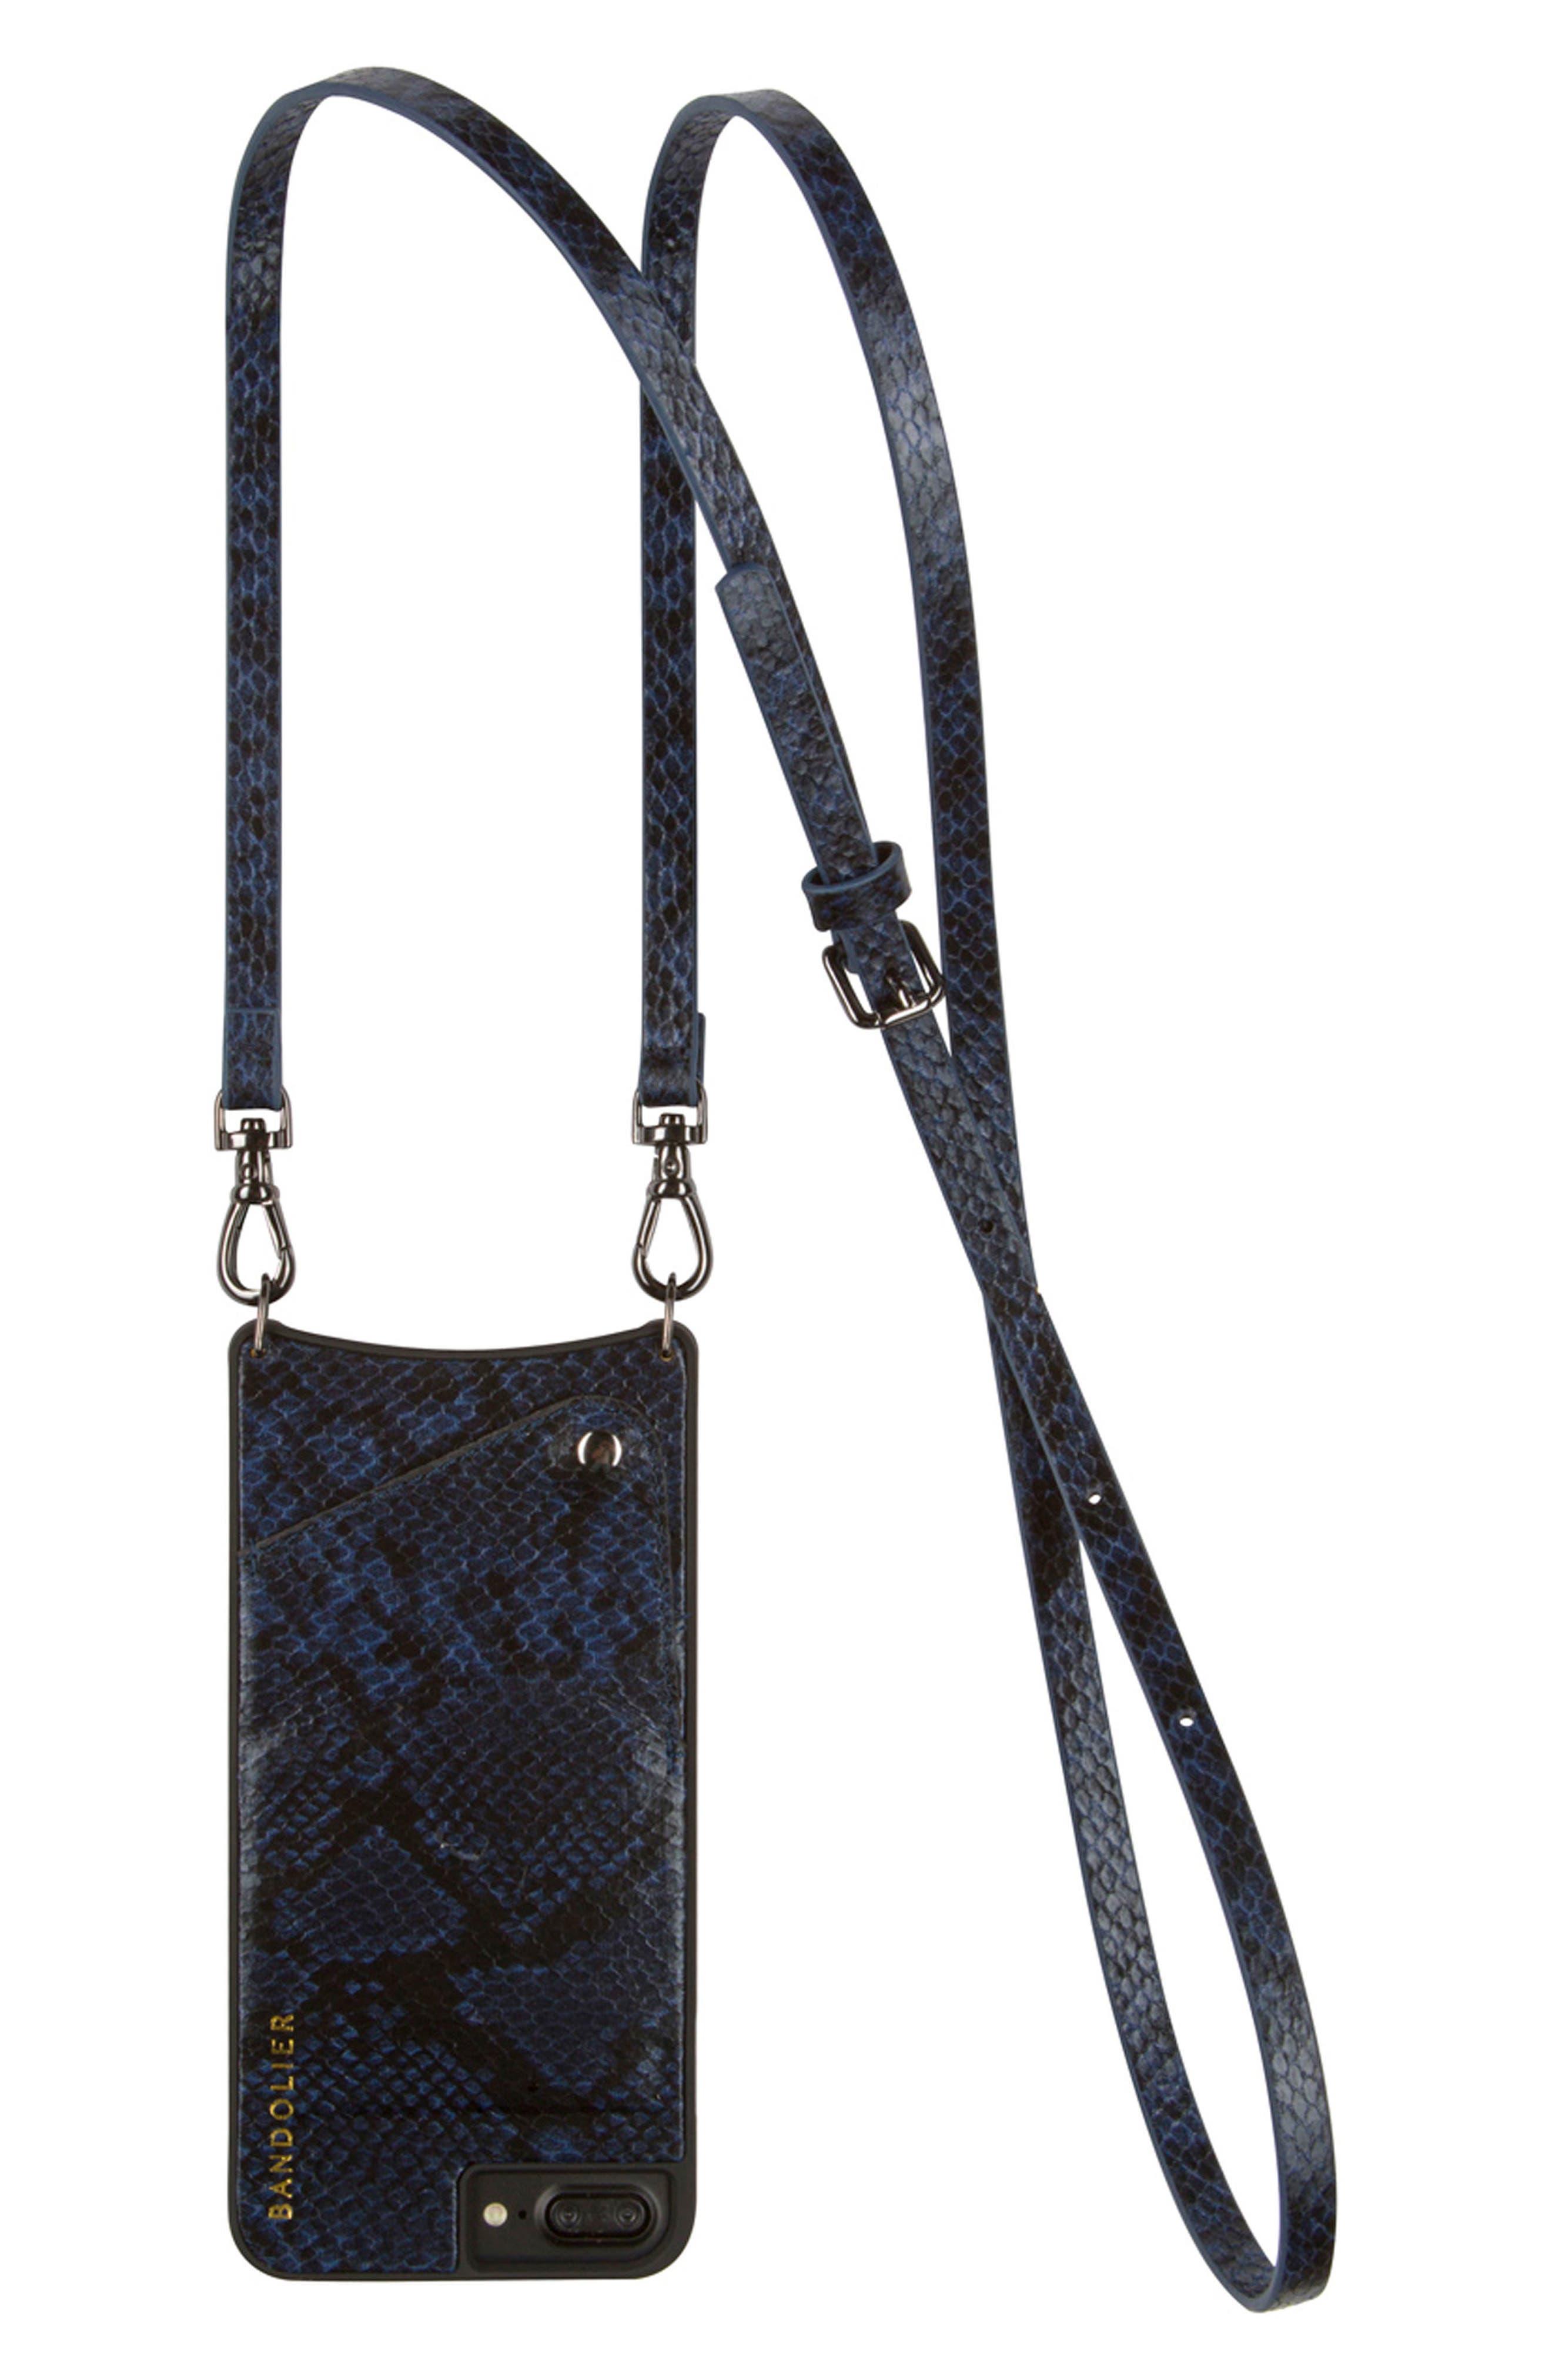 Bandolier Cynthia Snake Embossed Faux Leather iPhone Crossbody Case (6/7 & 6/7 Plus)